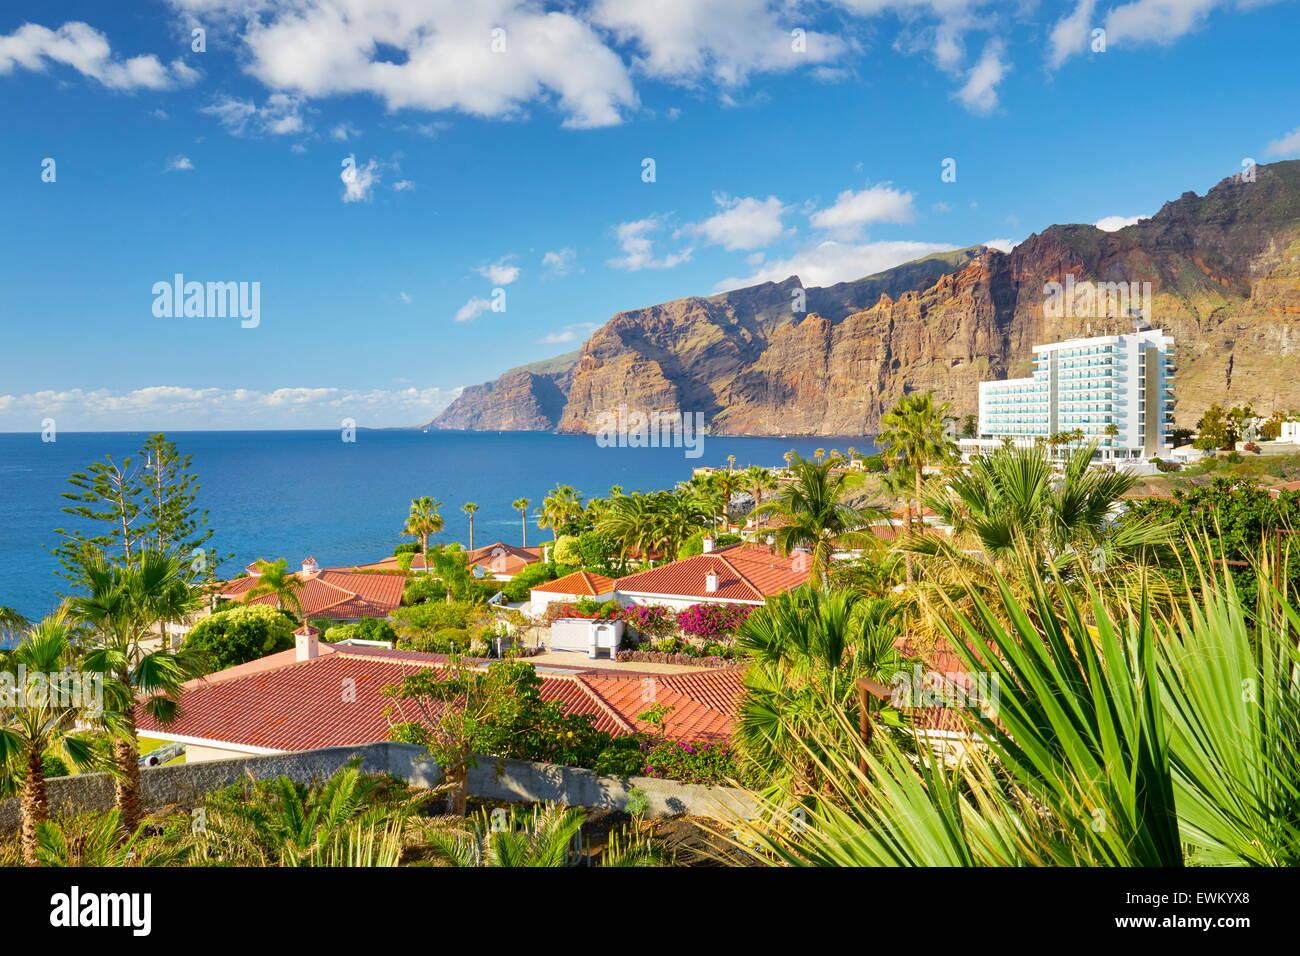 Tenerife, Los Gigantes, Canary Islands, Spain - Stock Image